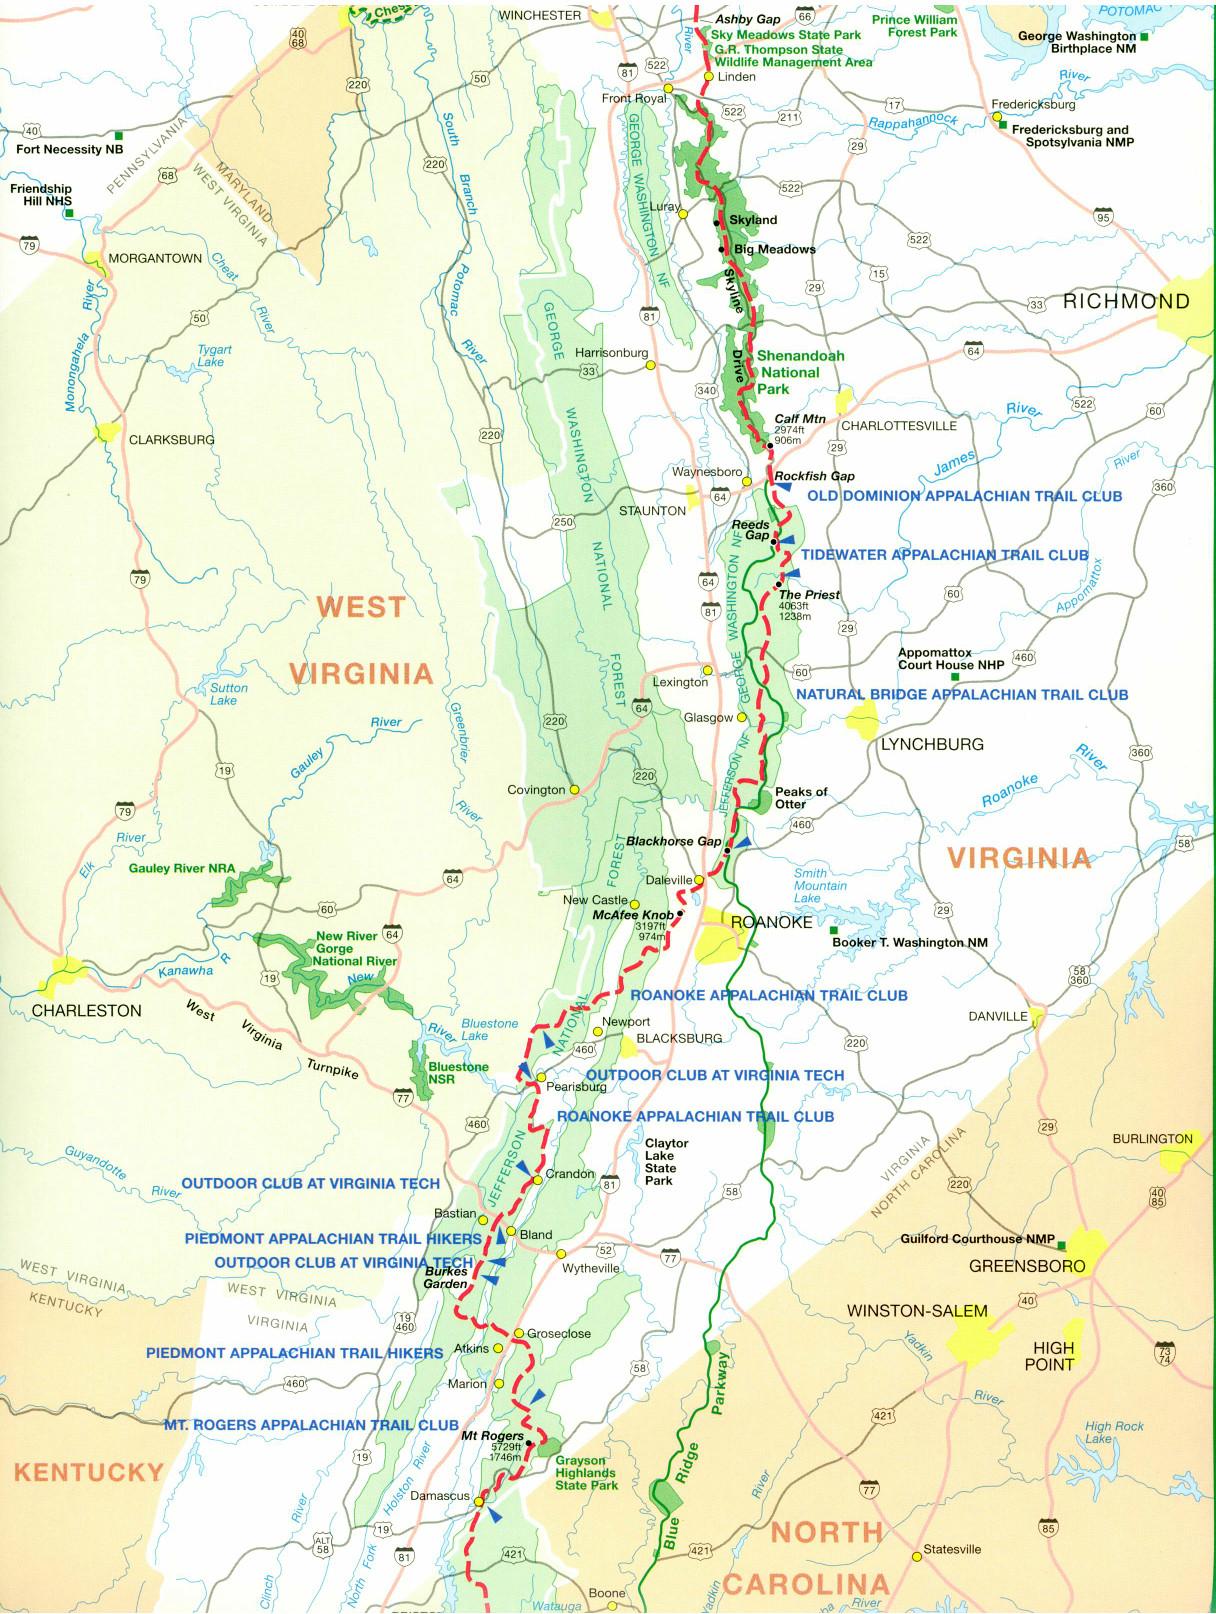 Gallery For Gt Appalachian Trail Map